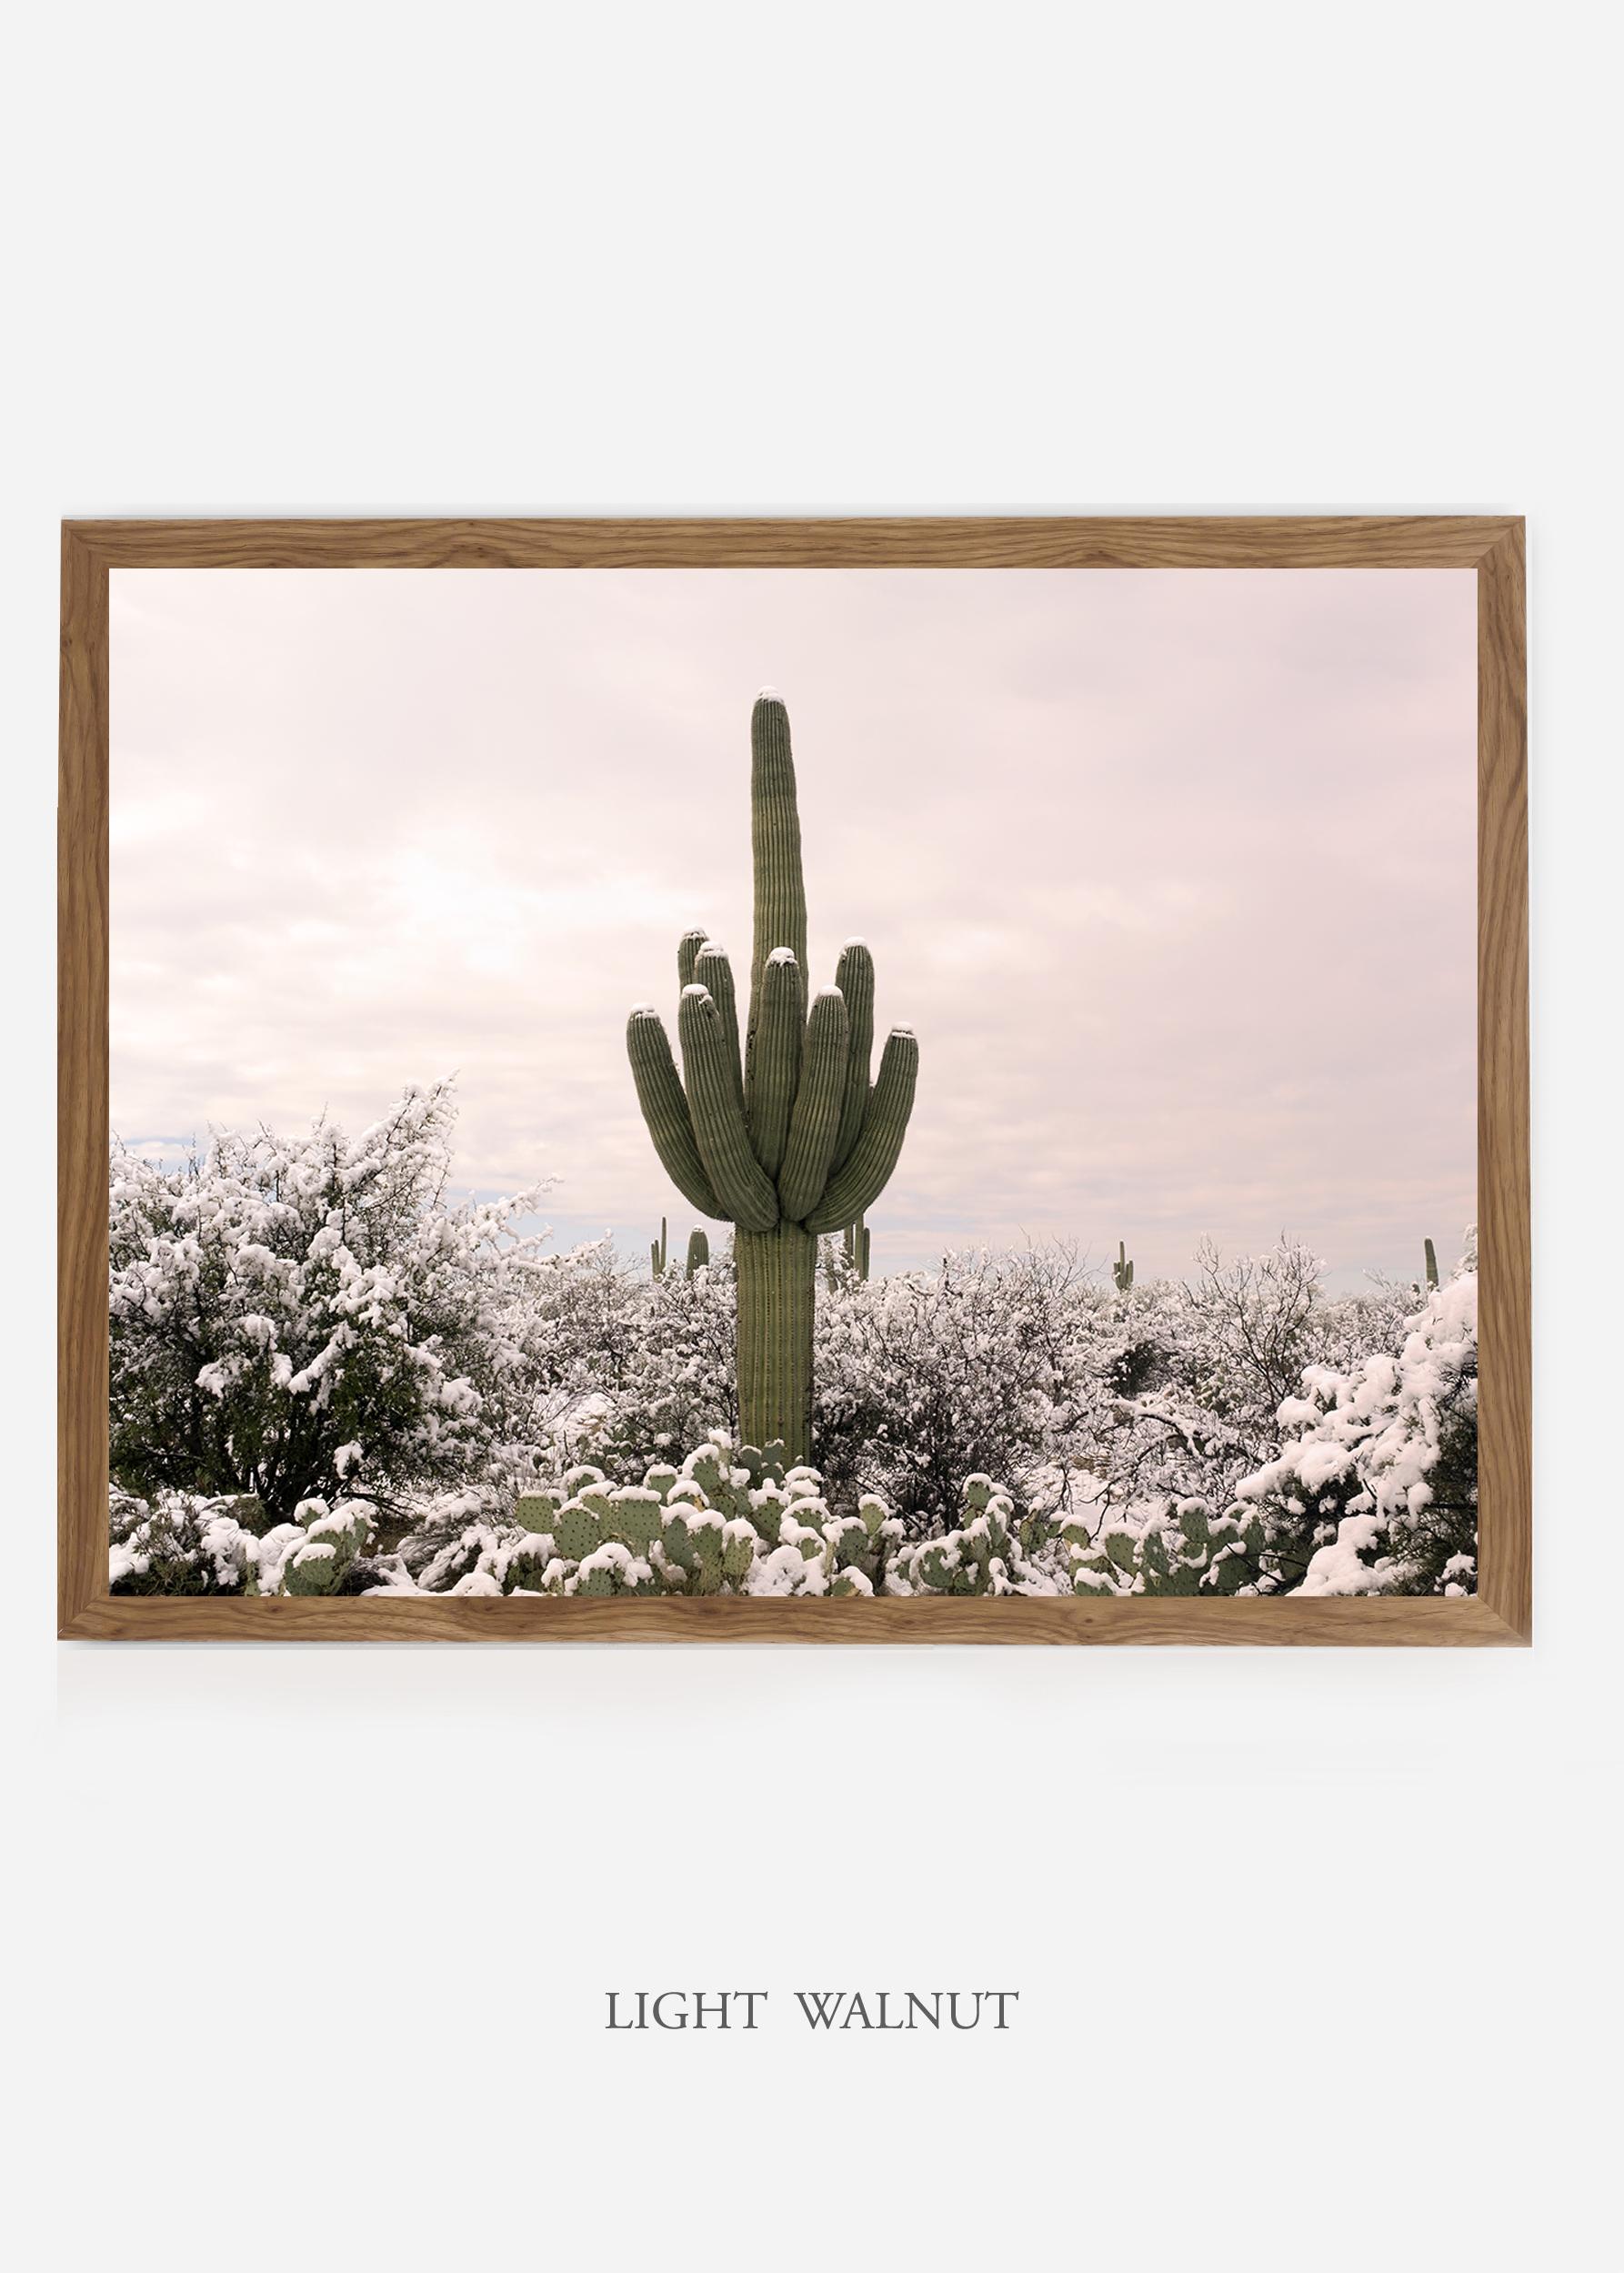 nomat_lightwalnutframe-saguaroNo.3-wildercalifornia-art-wallart-cactusprint-homedecor-prints-arizona-botanical-artwork-interiordesign.jpg